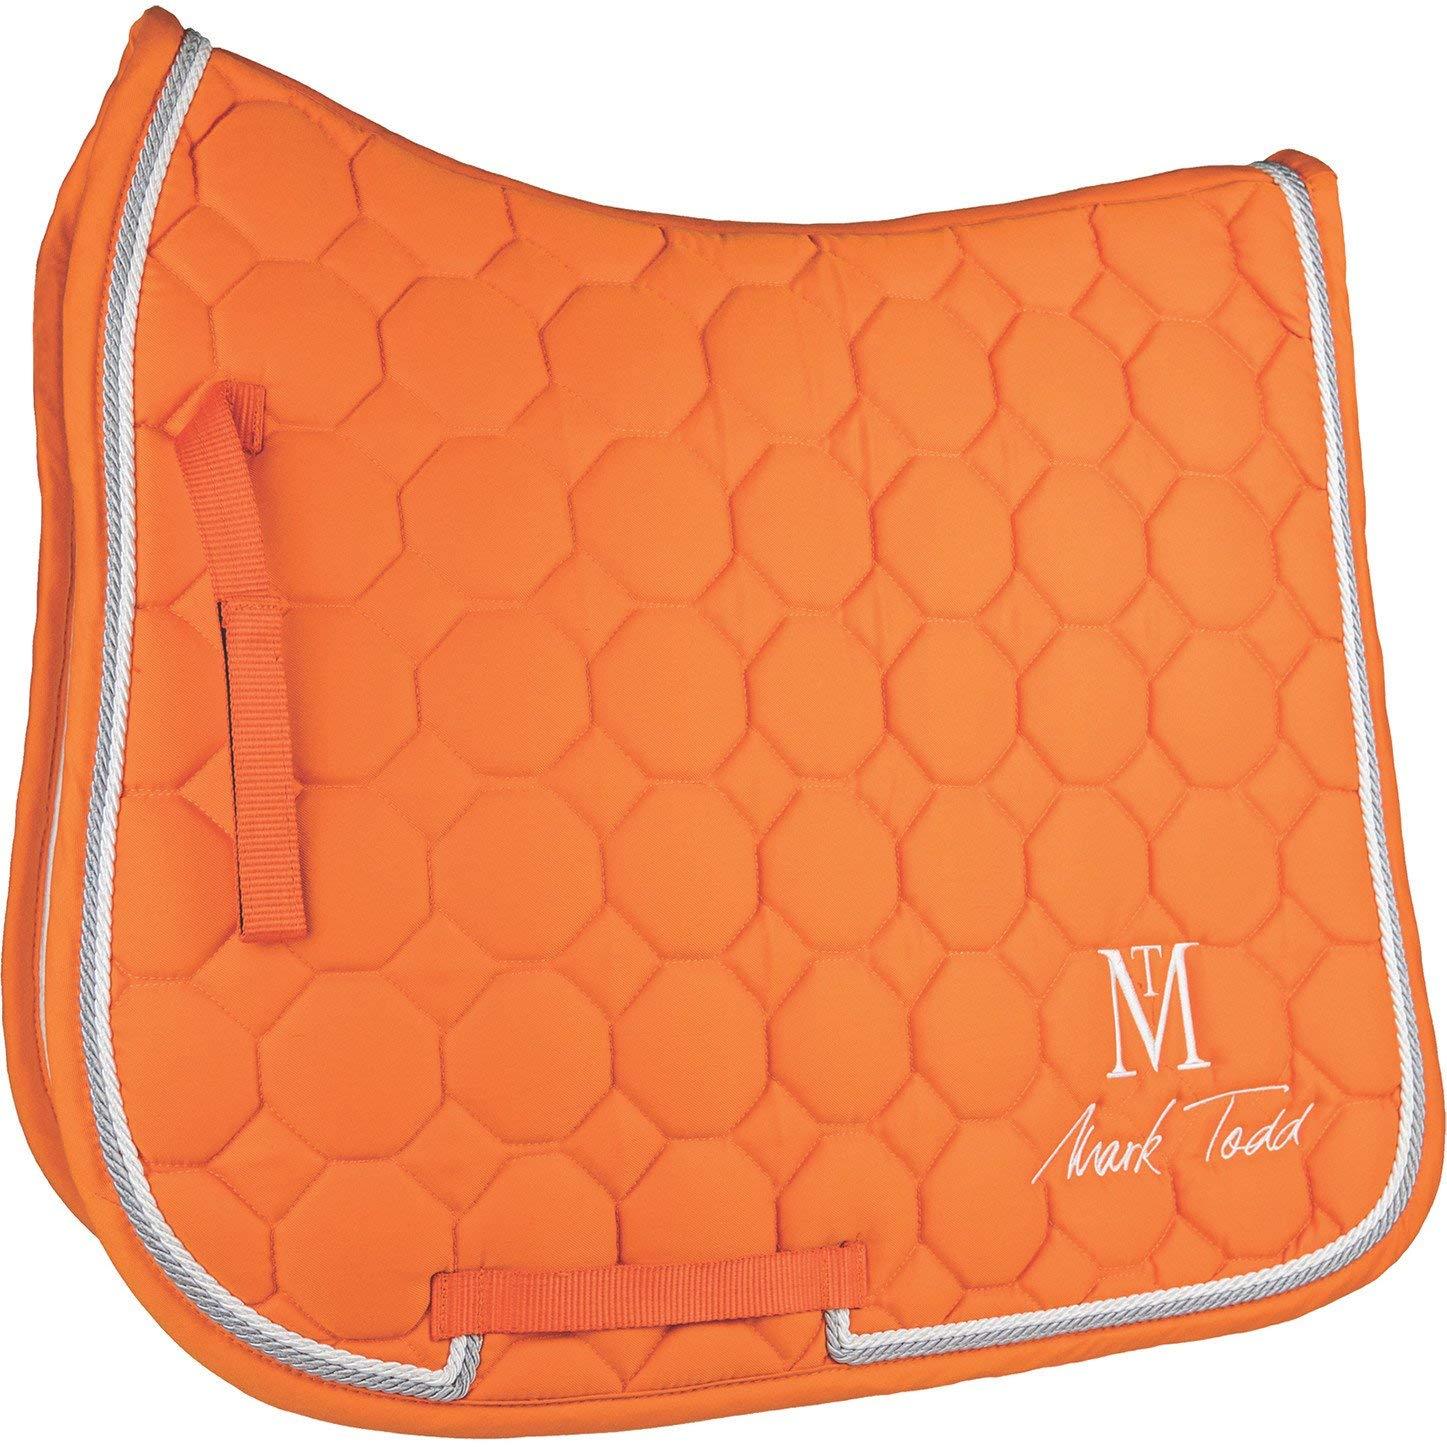 Mark Todd Matrix キルティングサドルパッド フルサイズ オレンジ   B07G9H4WG6